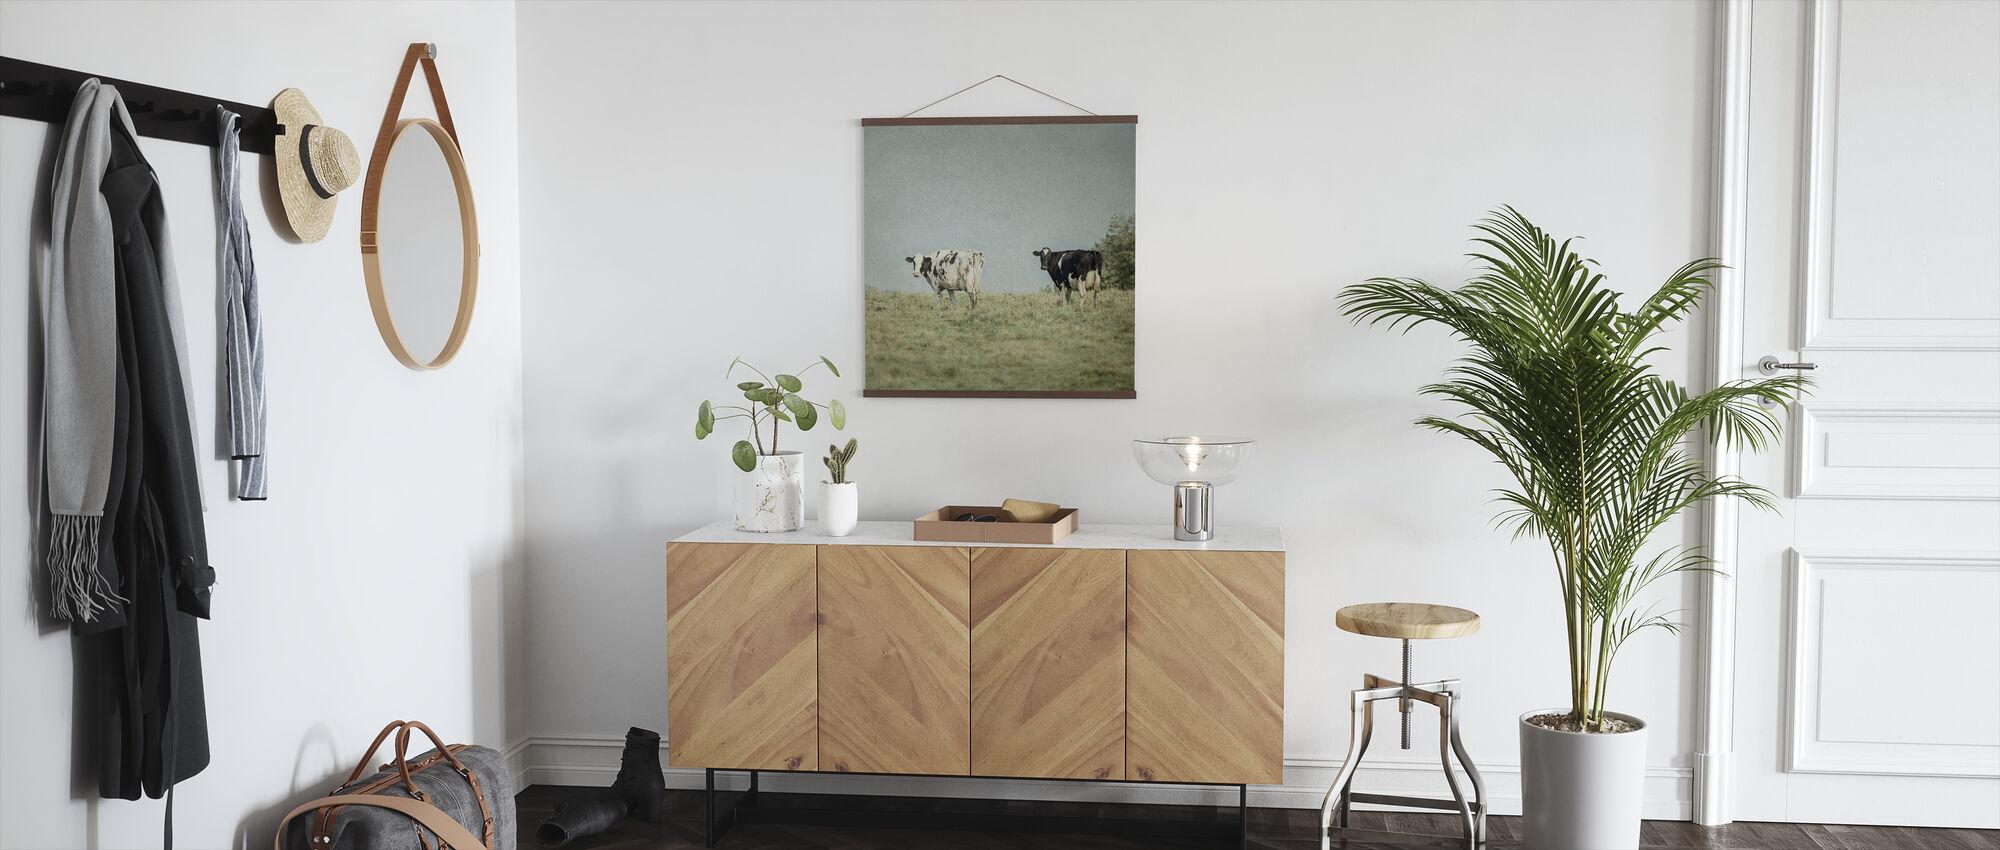 Grazing Cows - Poster - Hallway